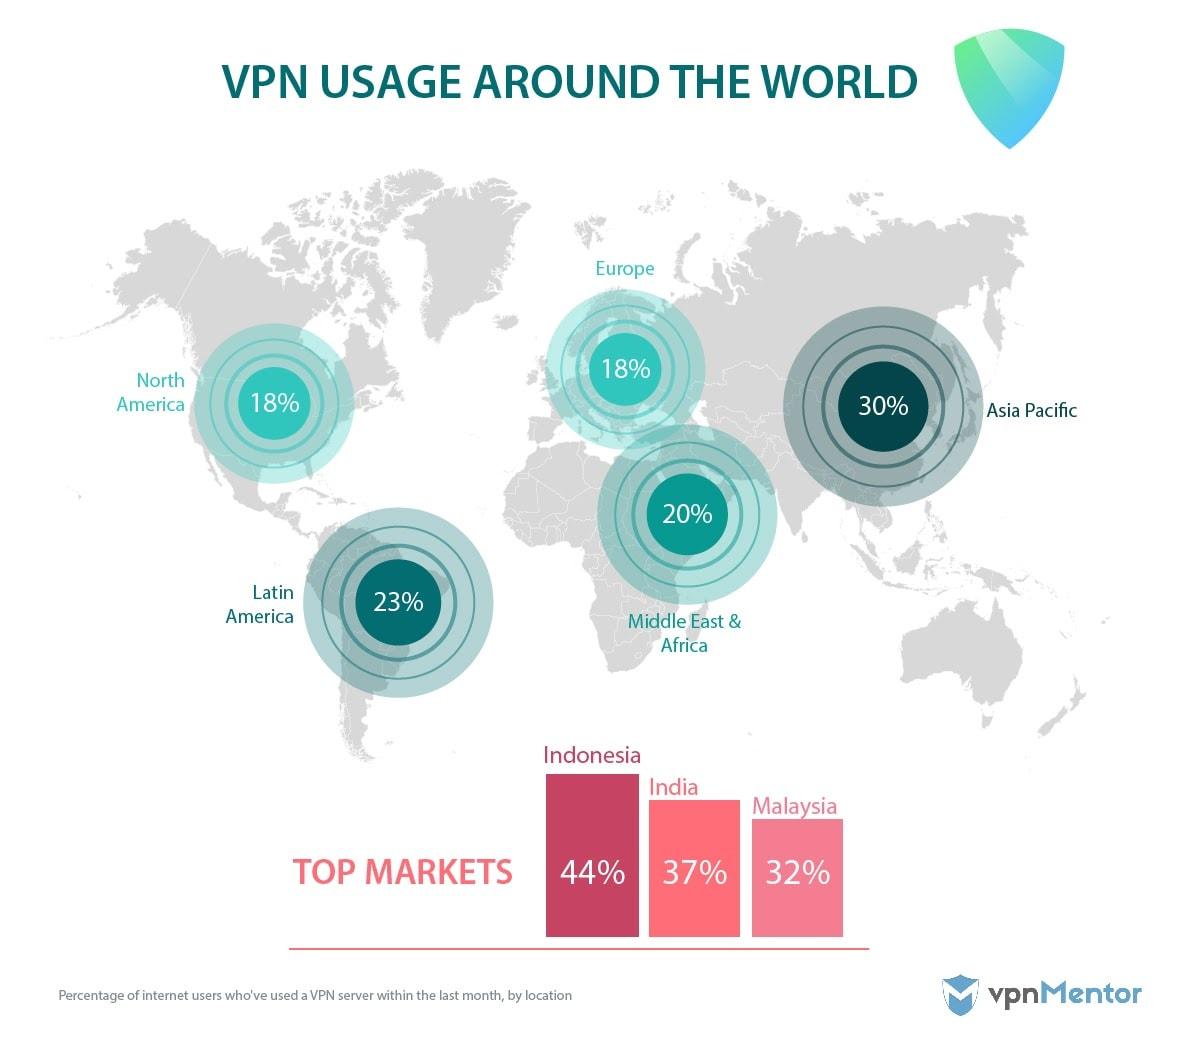 VPN use around the world